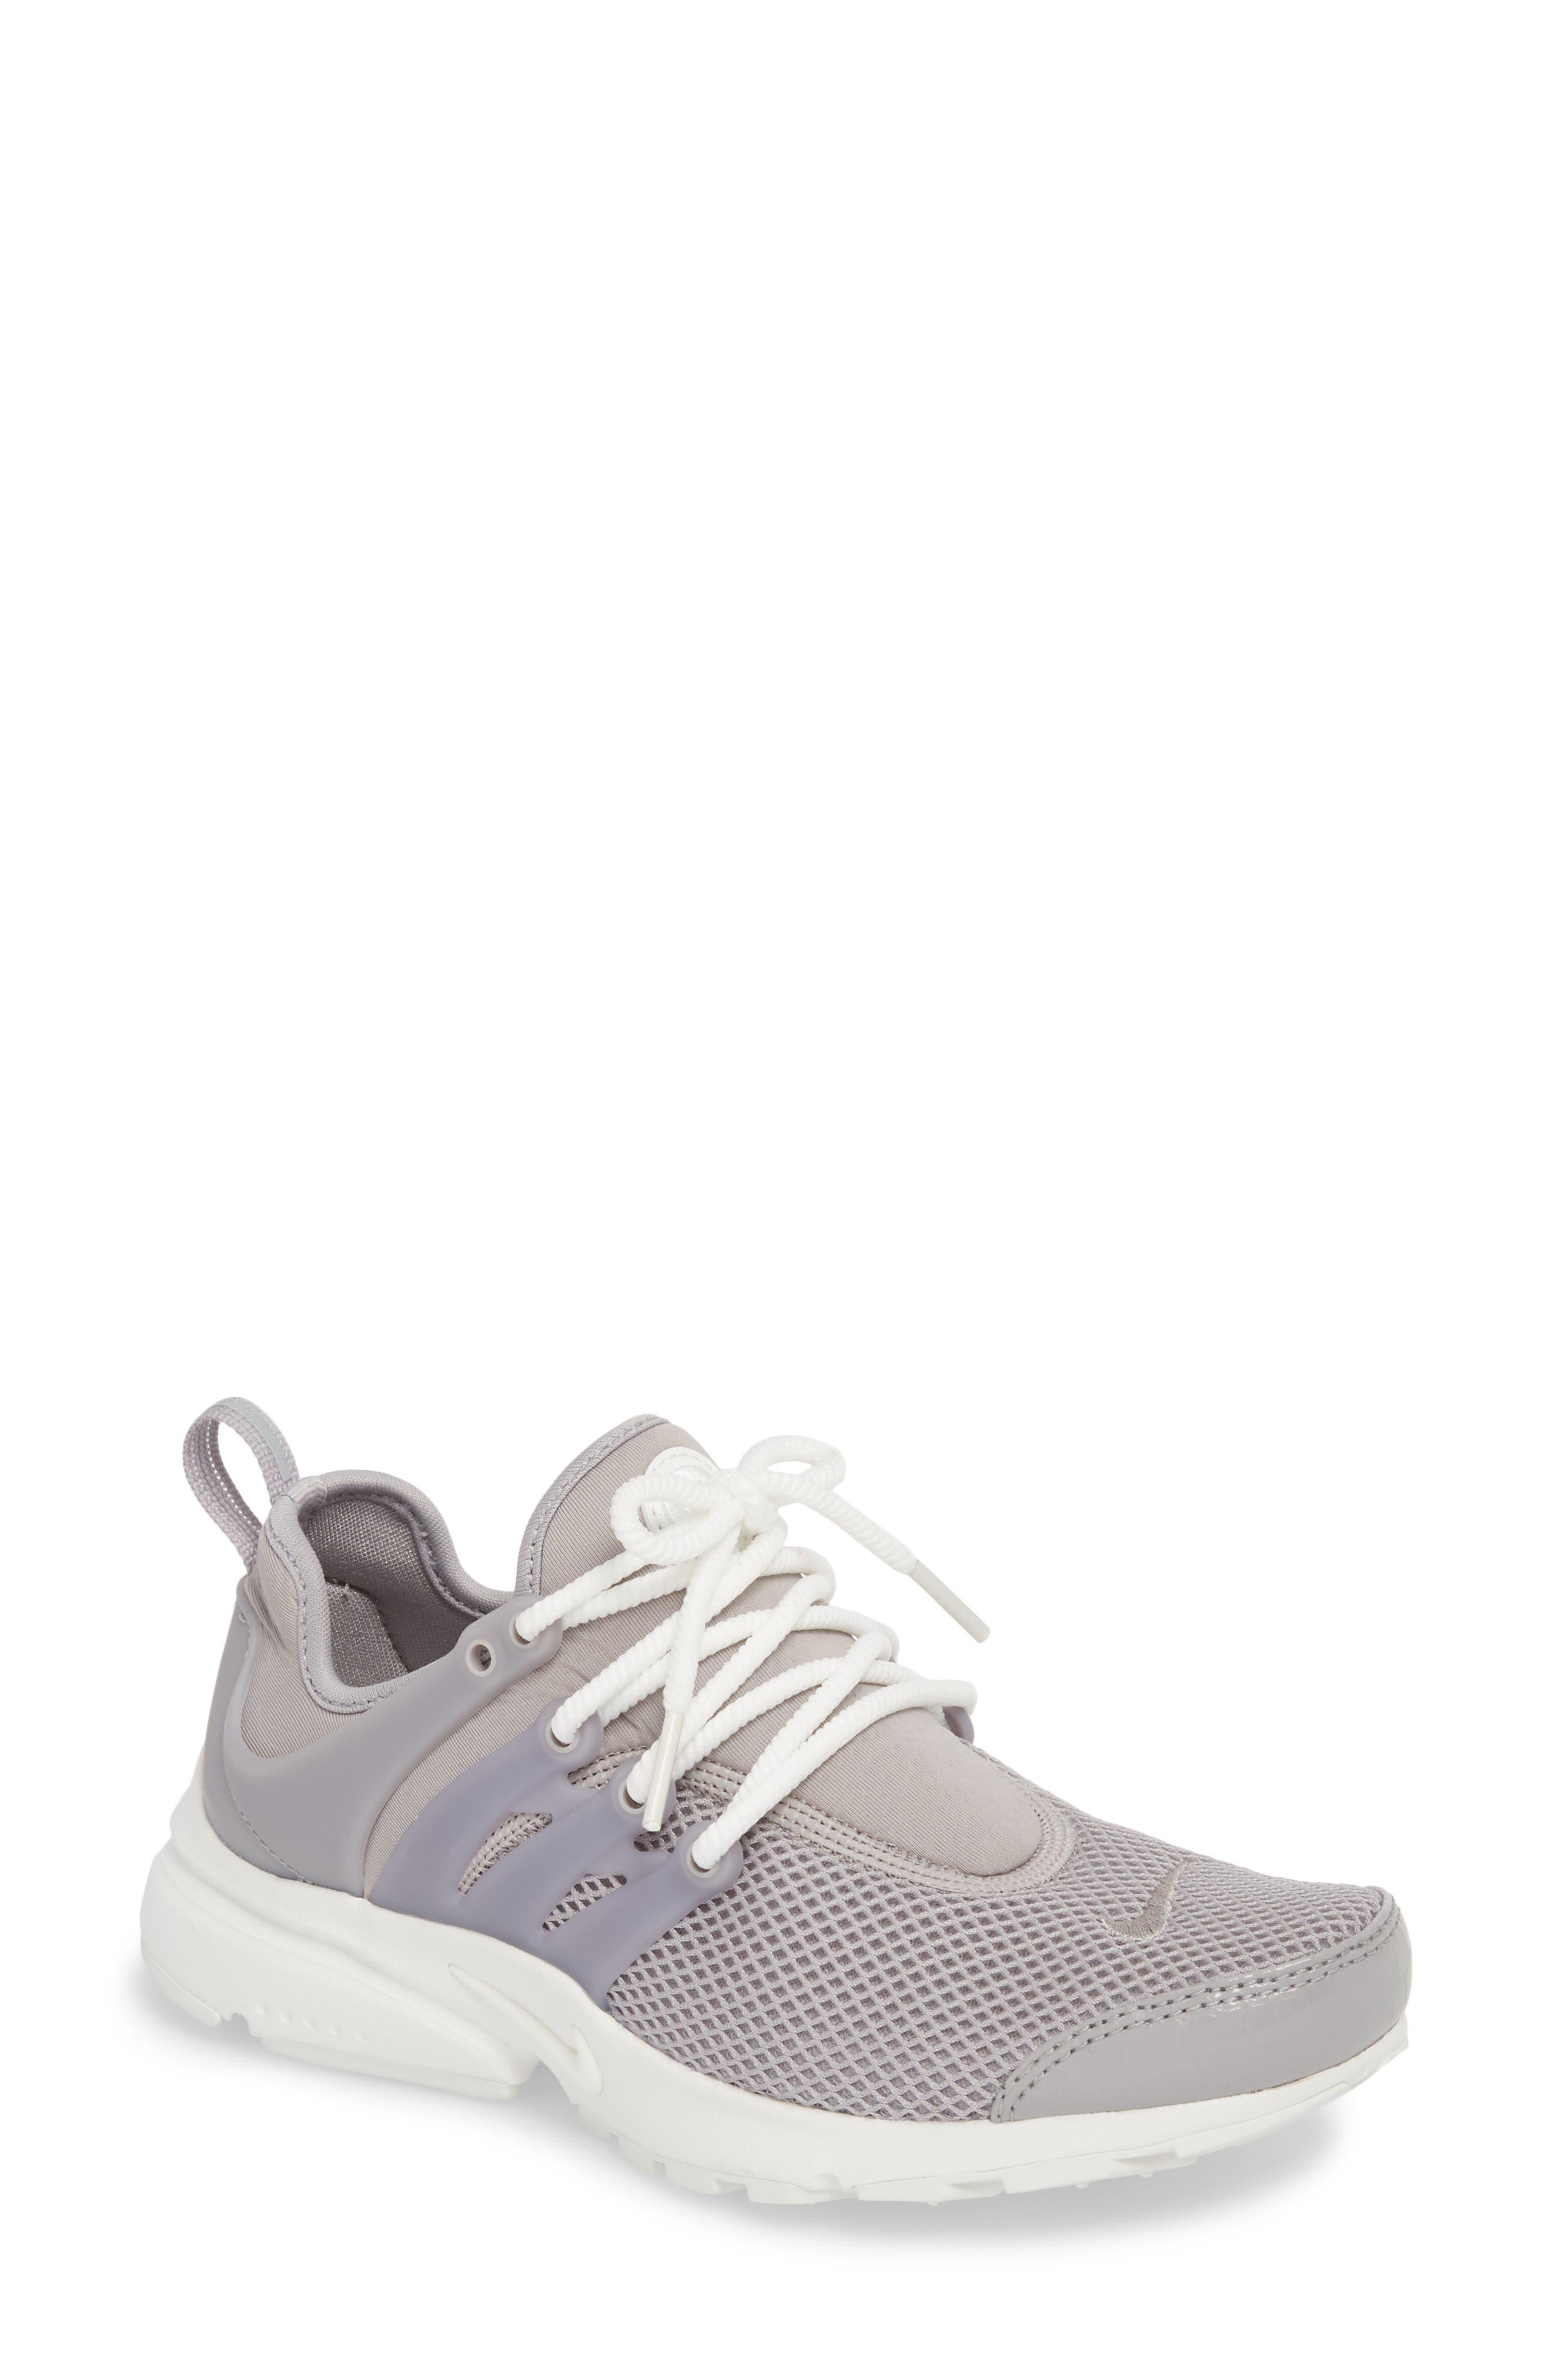 Nike Air Presto SE Sneaker (Women